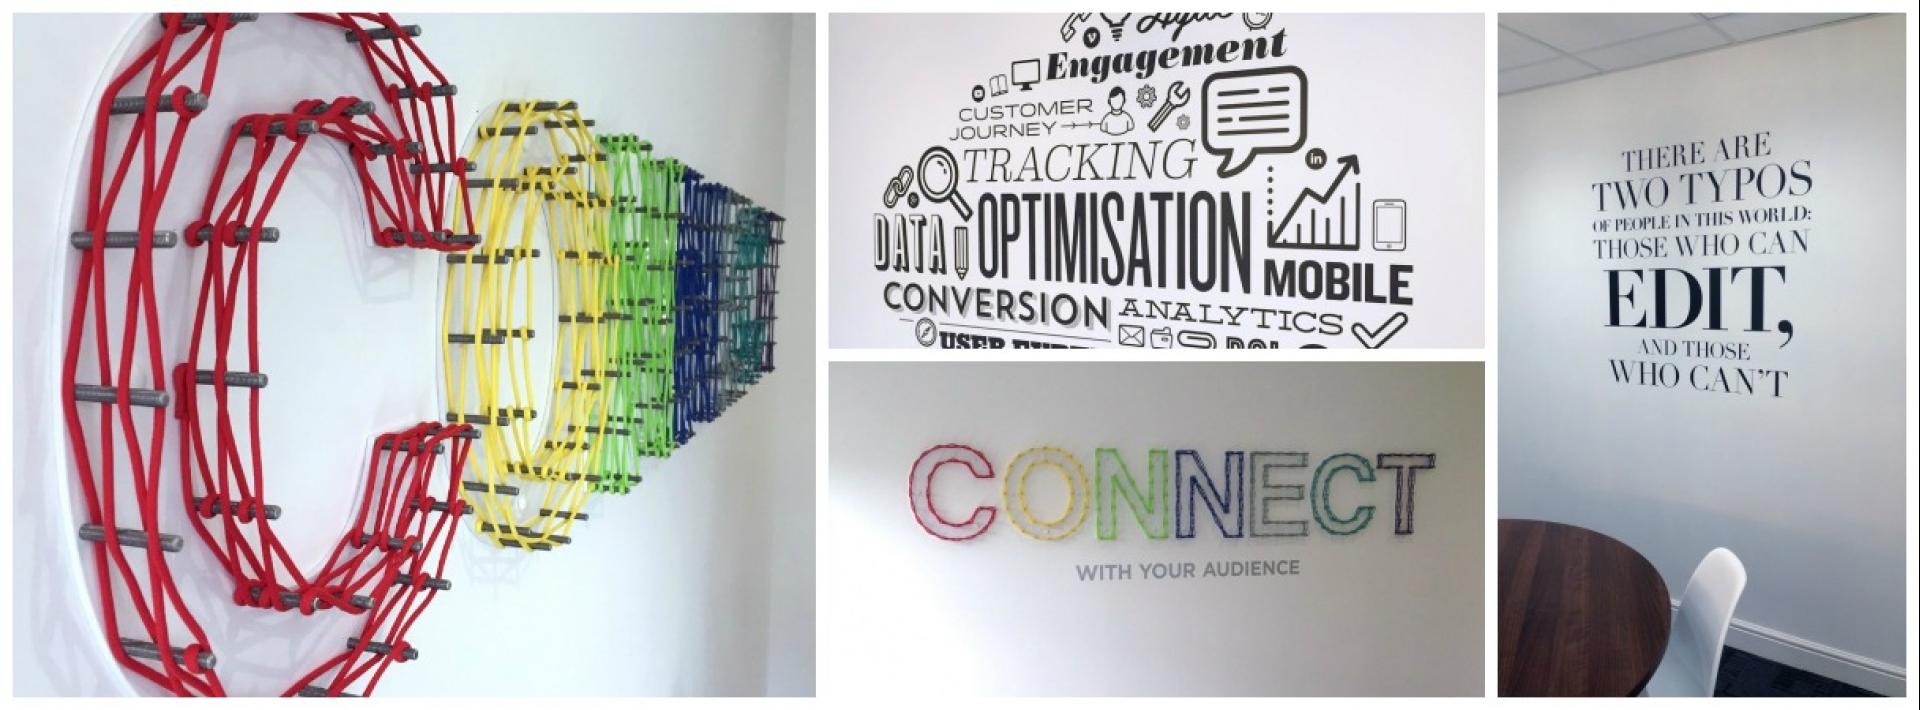 Media Matters office branding